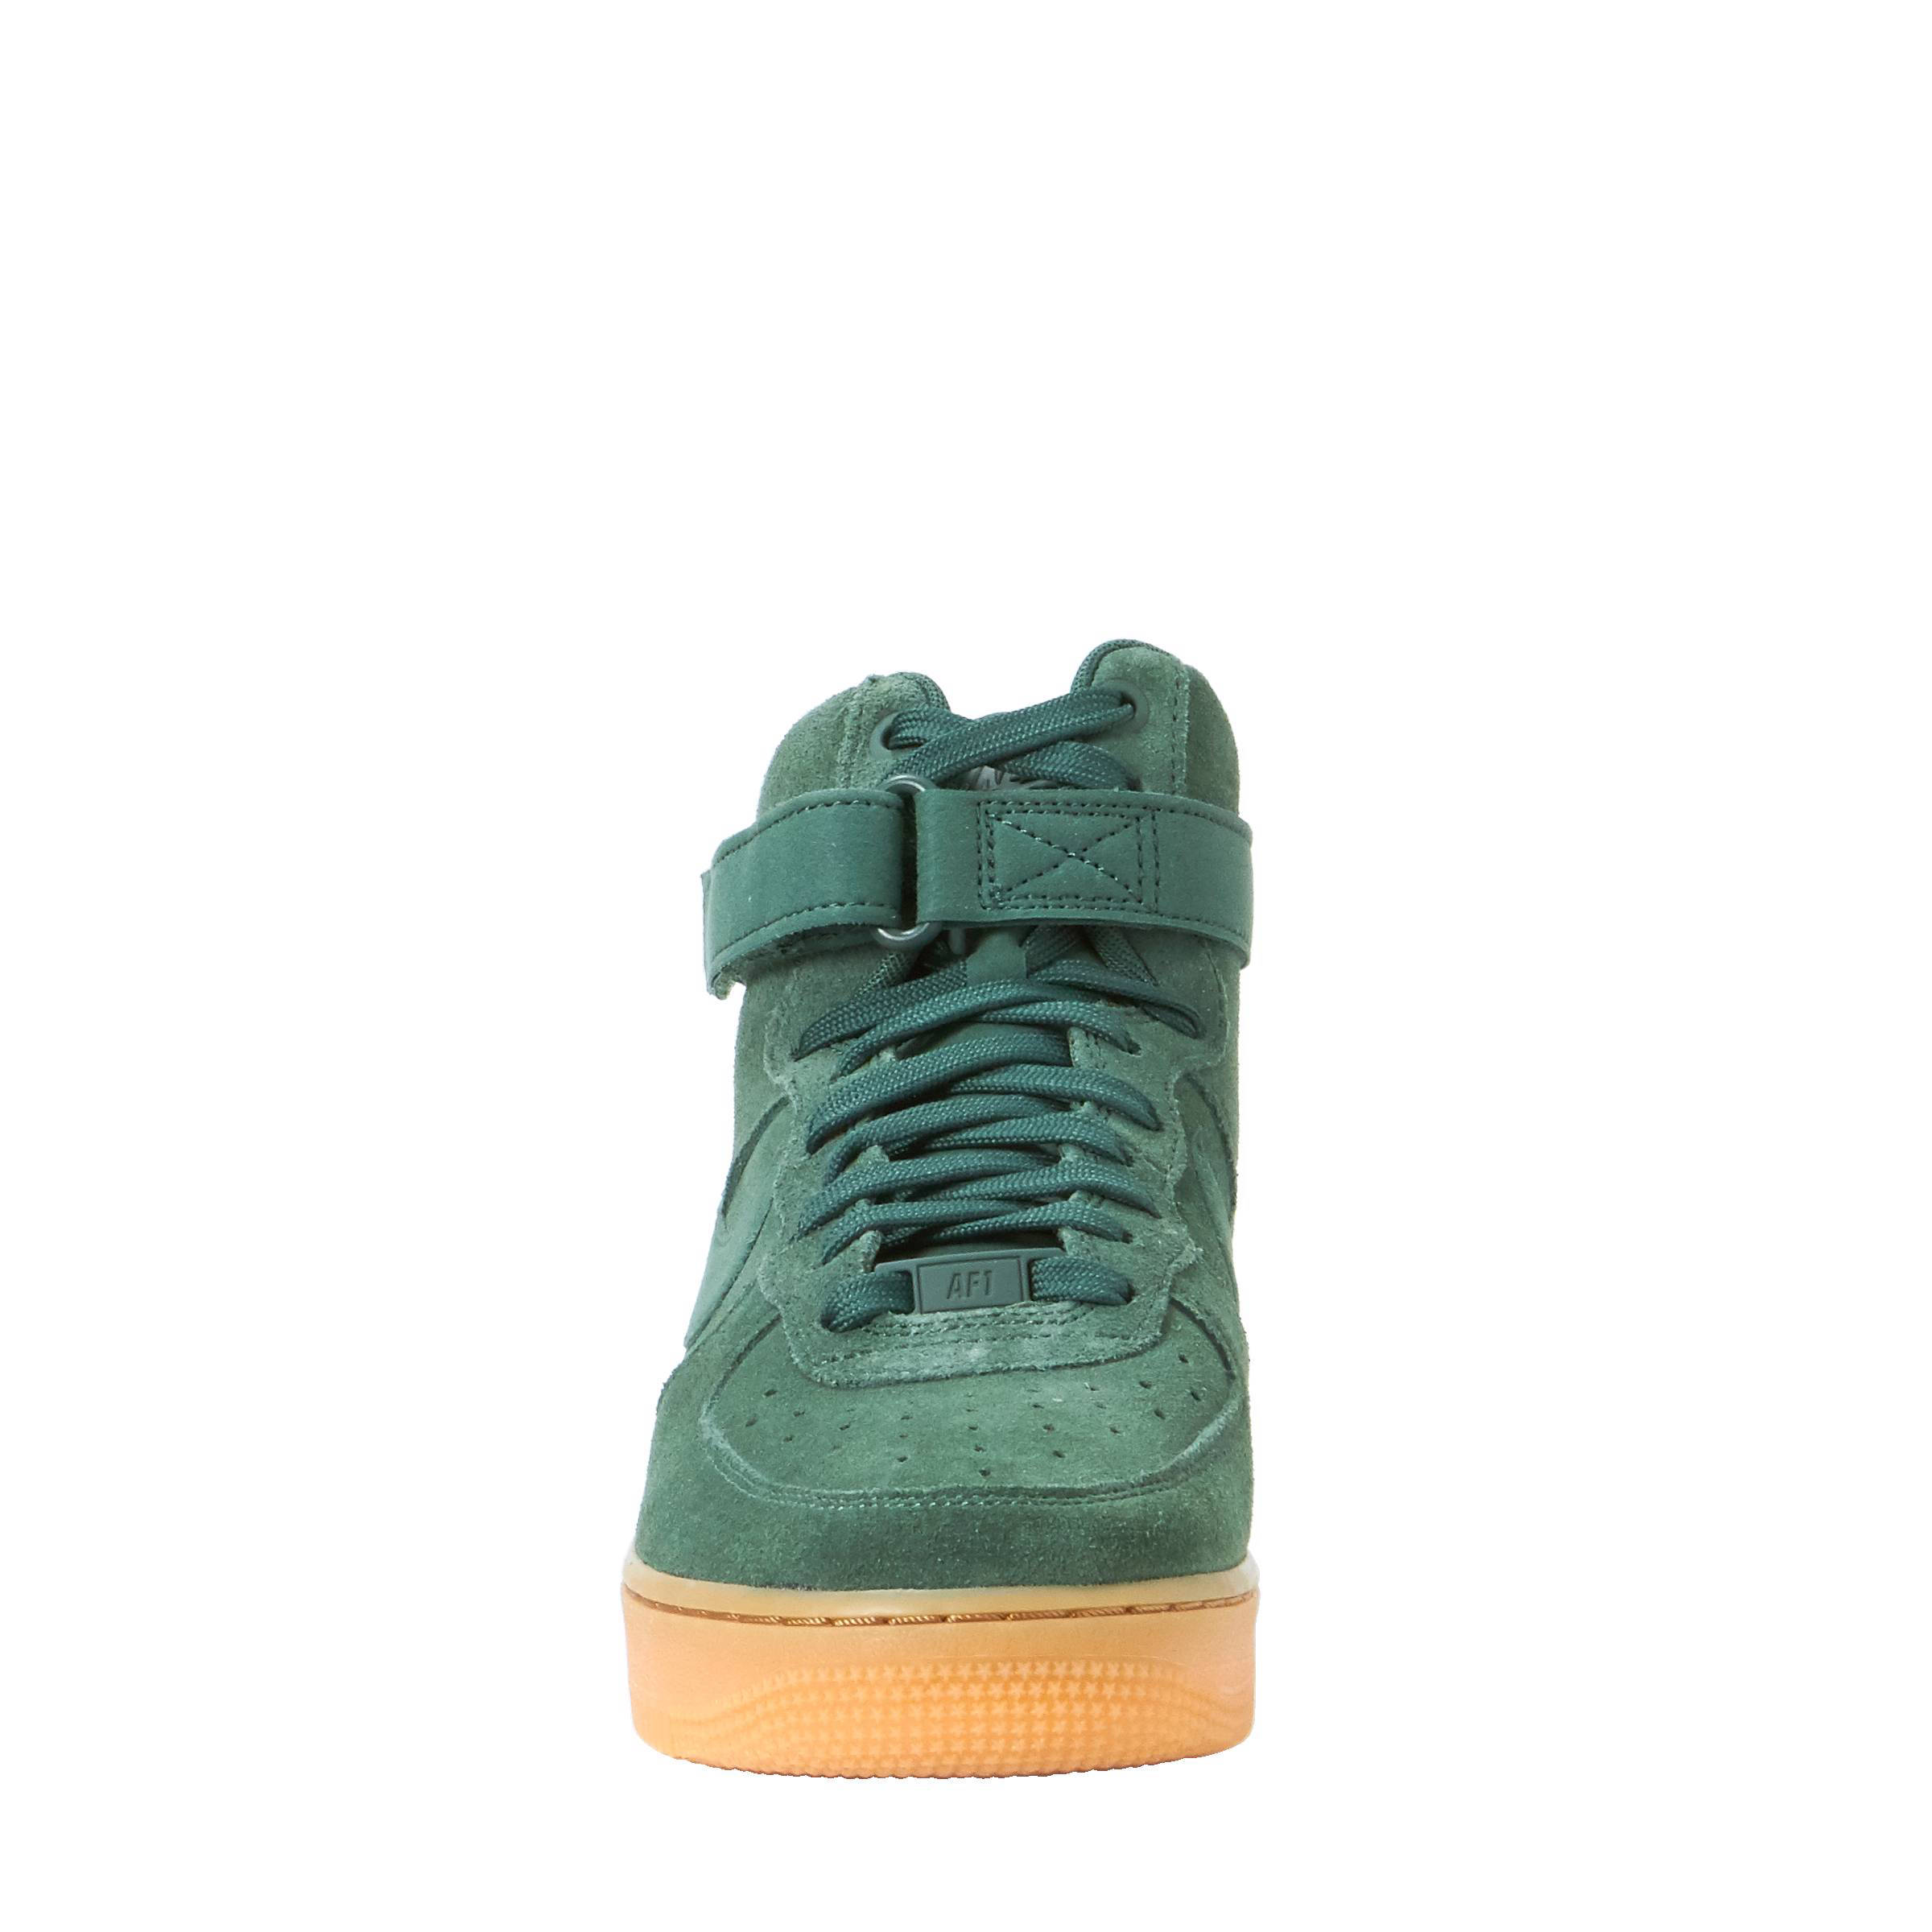 huge discount 96be0 c7fa7 nike-air-force-1-high-07-lv8-sneakers-donkergroen-0823233288423.jpg